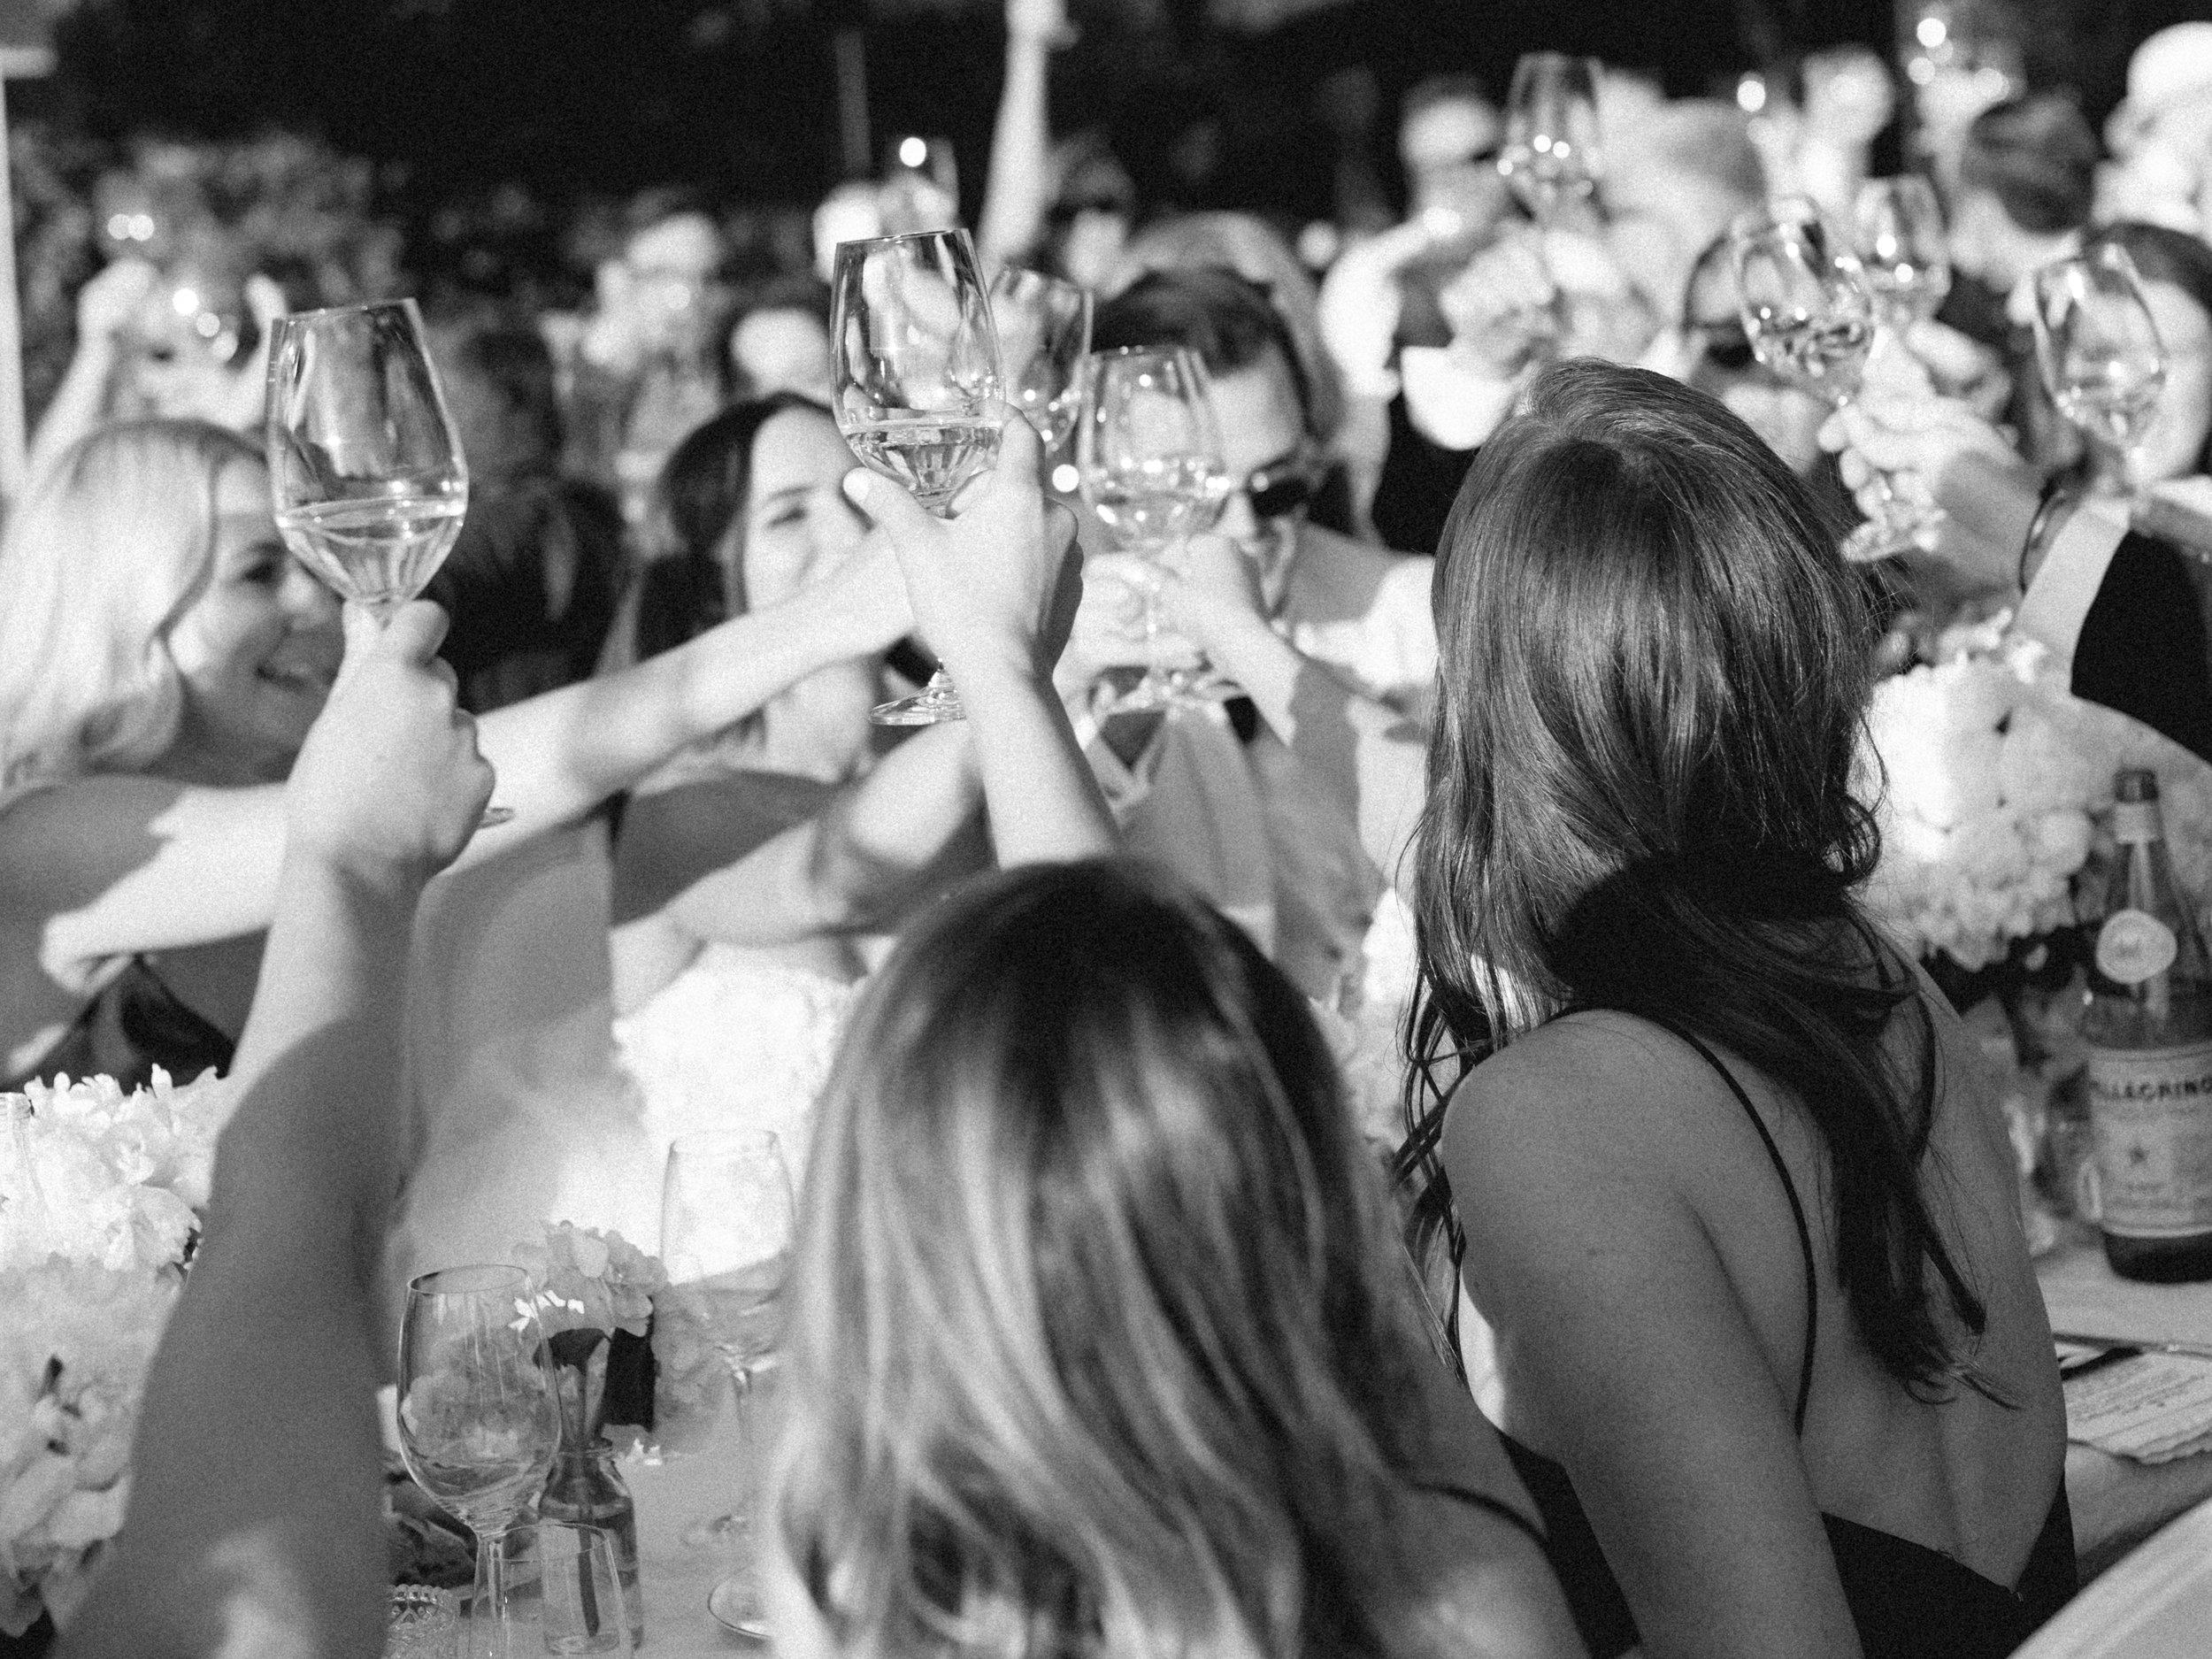 bastide_de_gordes_provence_wedding_(c)_rory-wylie-57.jpg